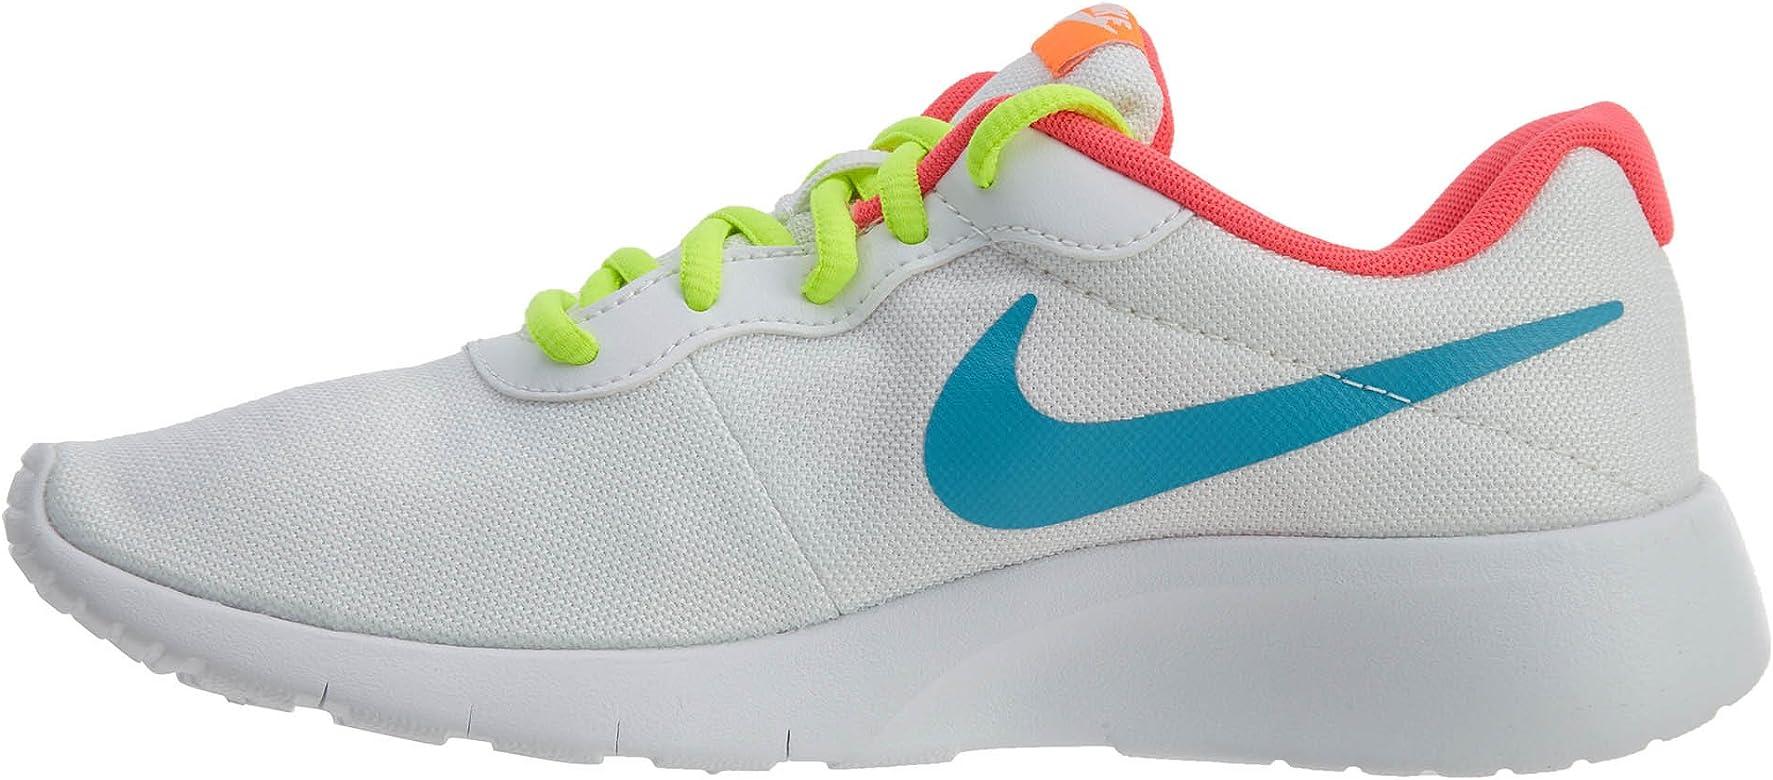 279bd10f72 Nike Tanjun Big Kids Style: 818384-100 Size: 6.5. Back. Double-tap to zoom